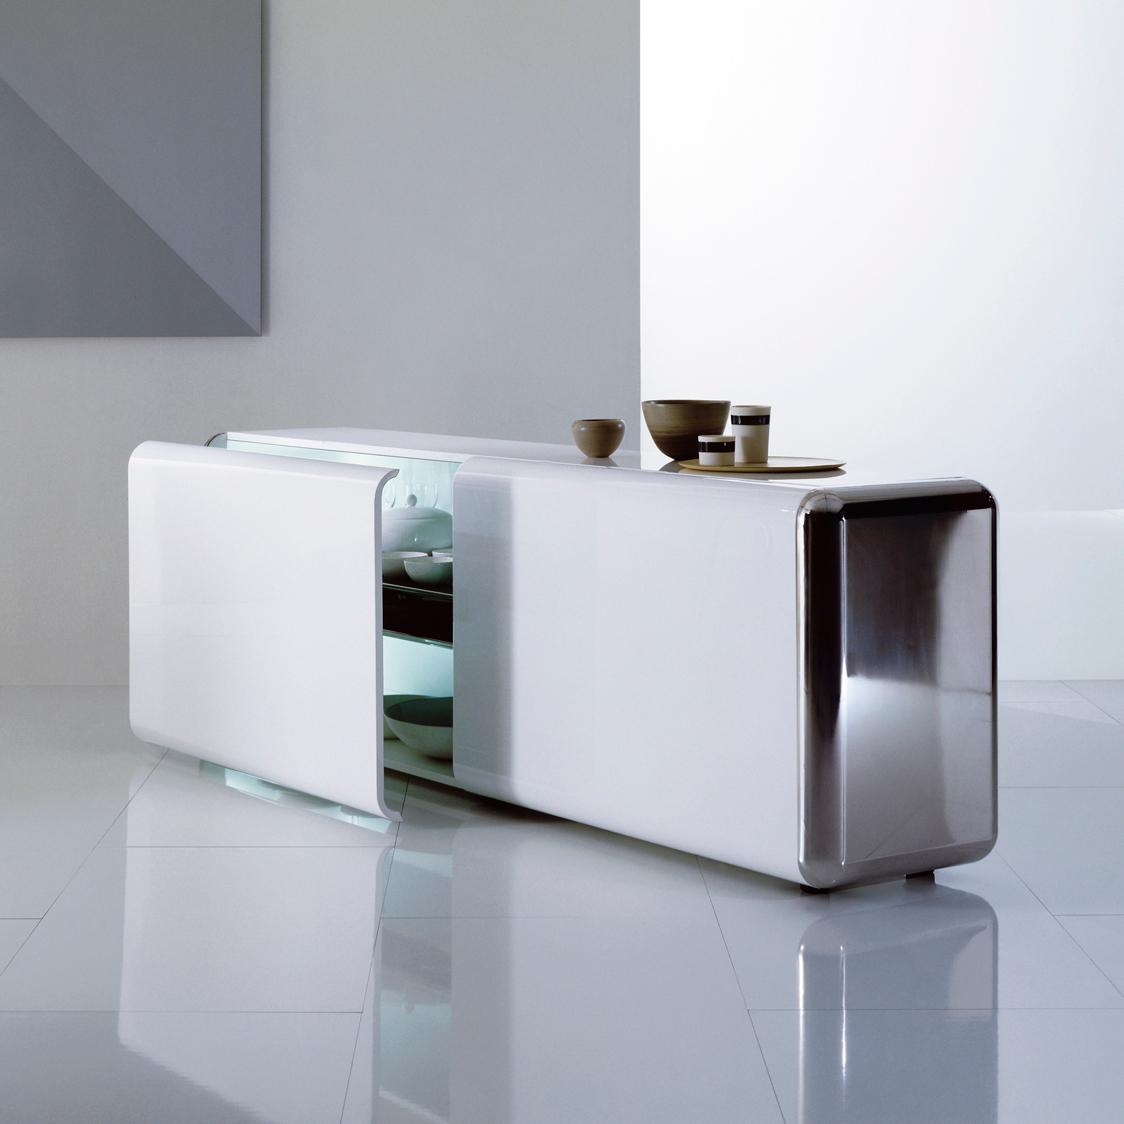 Sideboard Designer luxury italian designer superego sideboard - italian designer